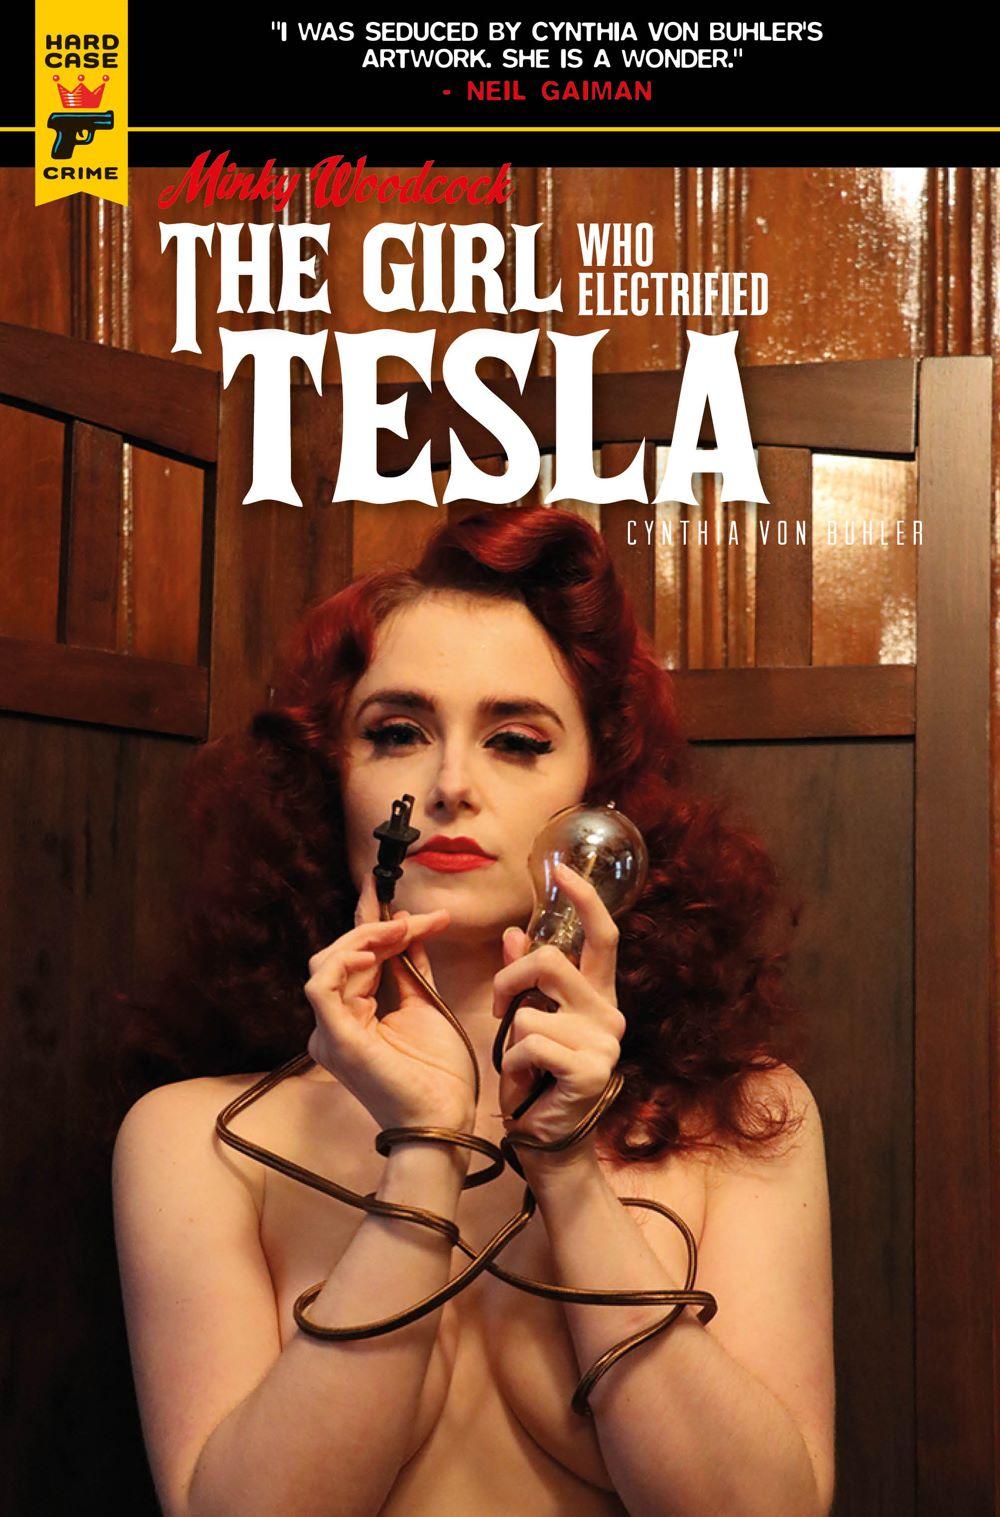 Minky-Woodcock-Cover-C-Photo ComicList Previews: MINKY WOODCOCK THE GIRL WHO ELECTRIFIED TESLA #1